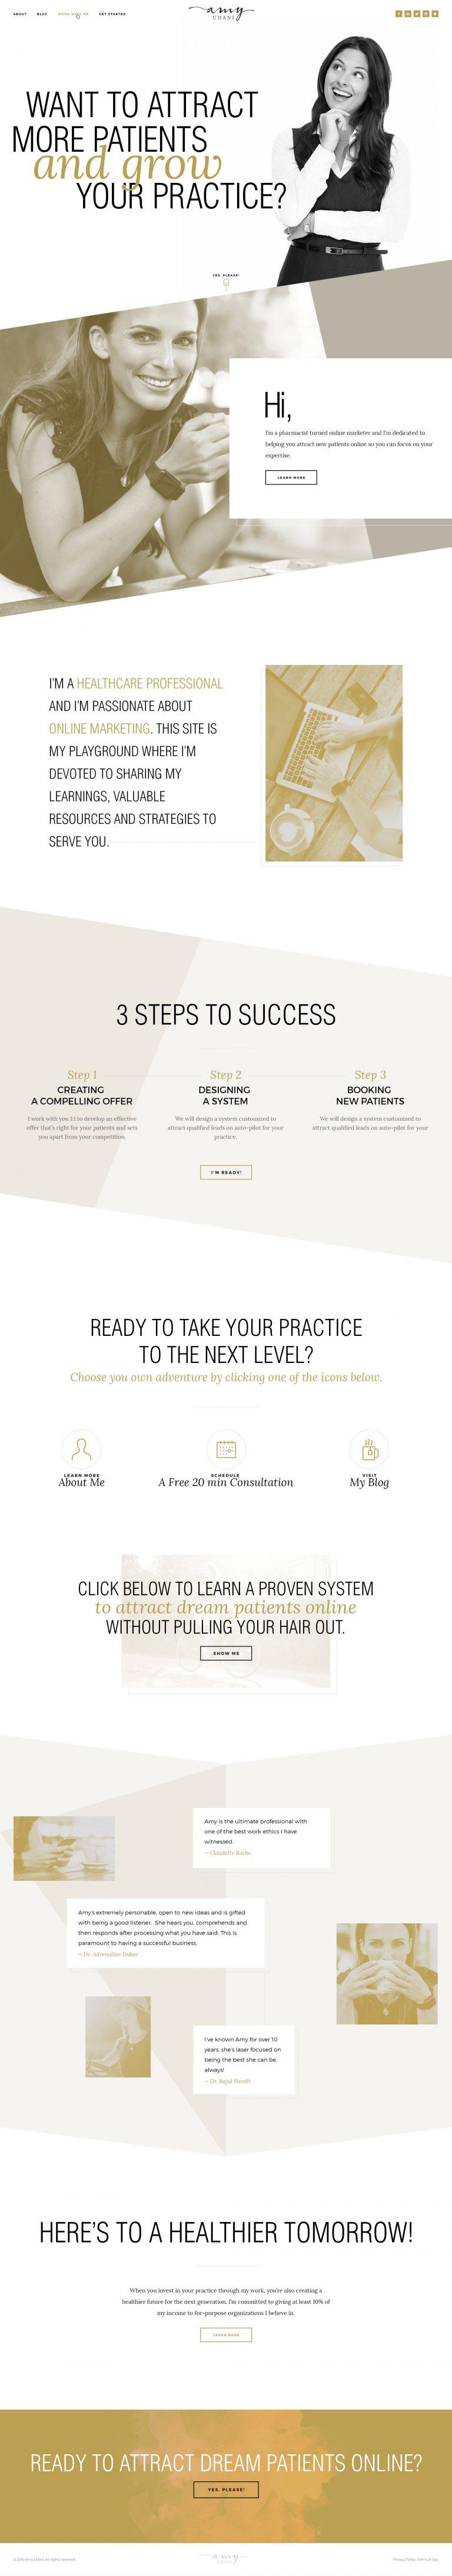 Version 2 of a website design for a female entrepreneur